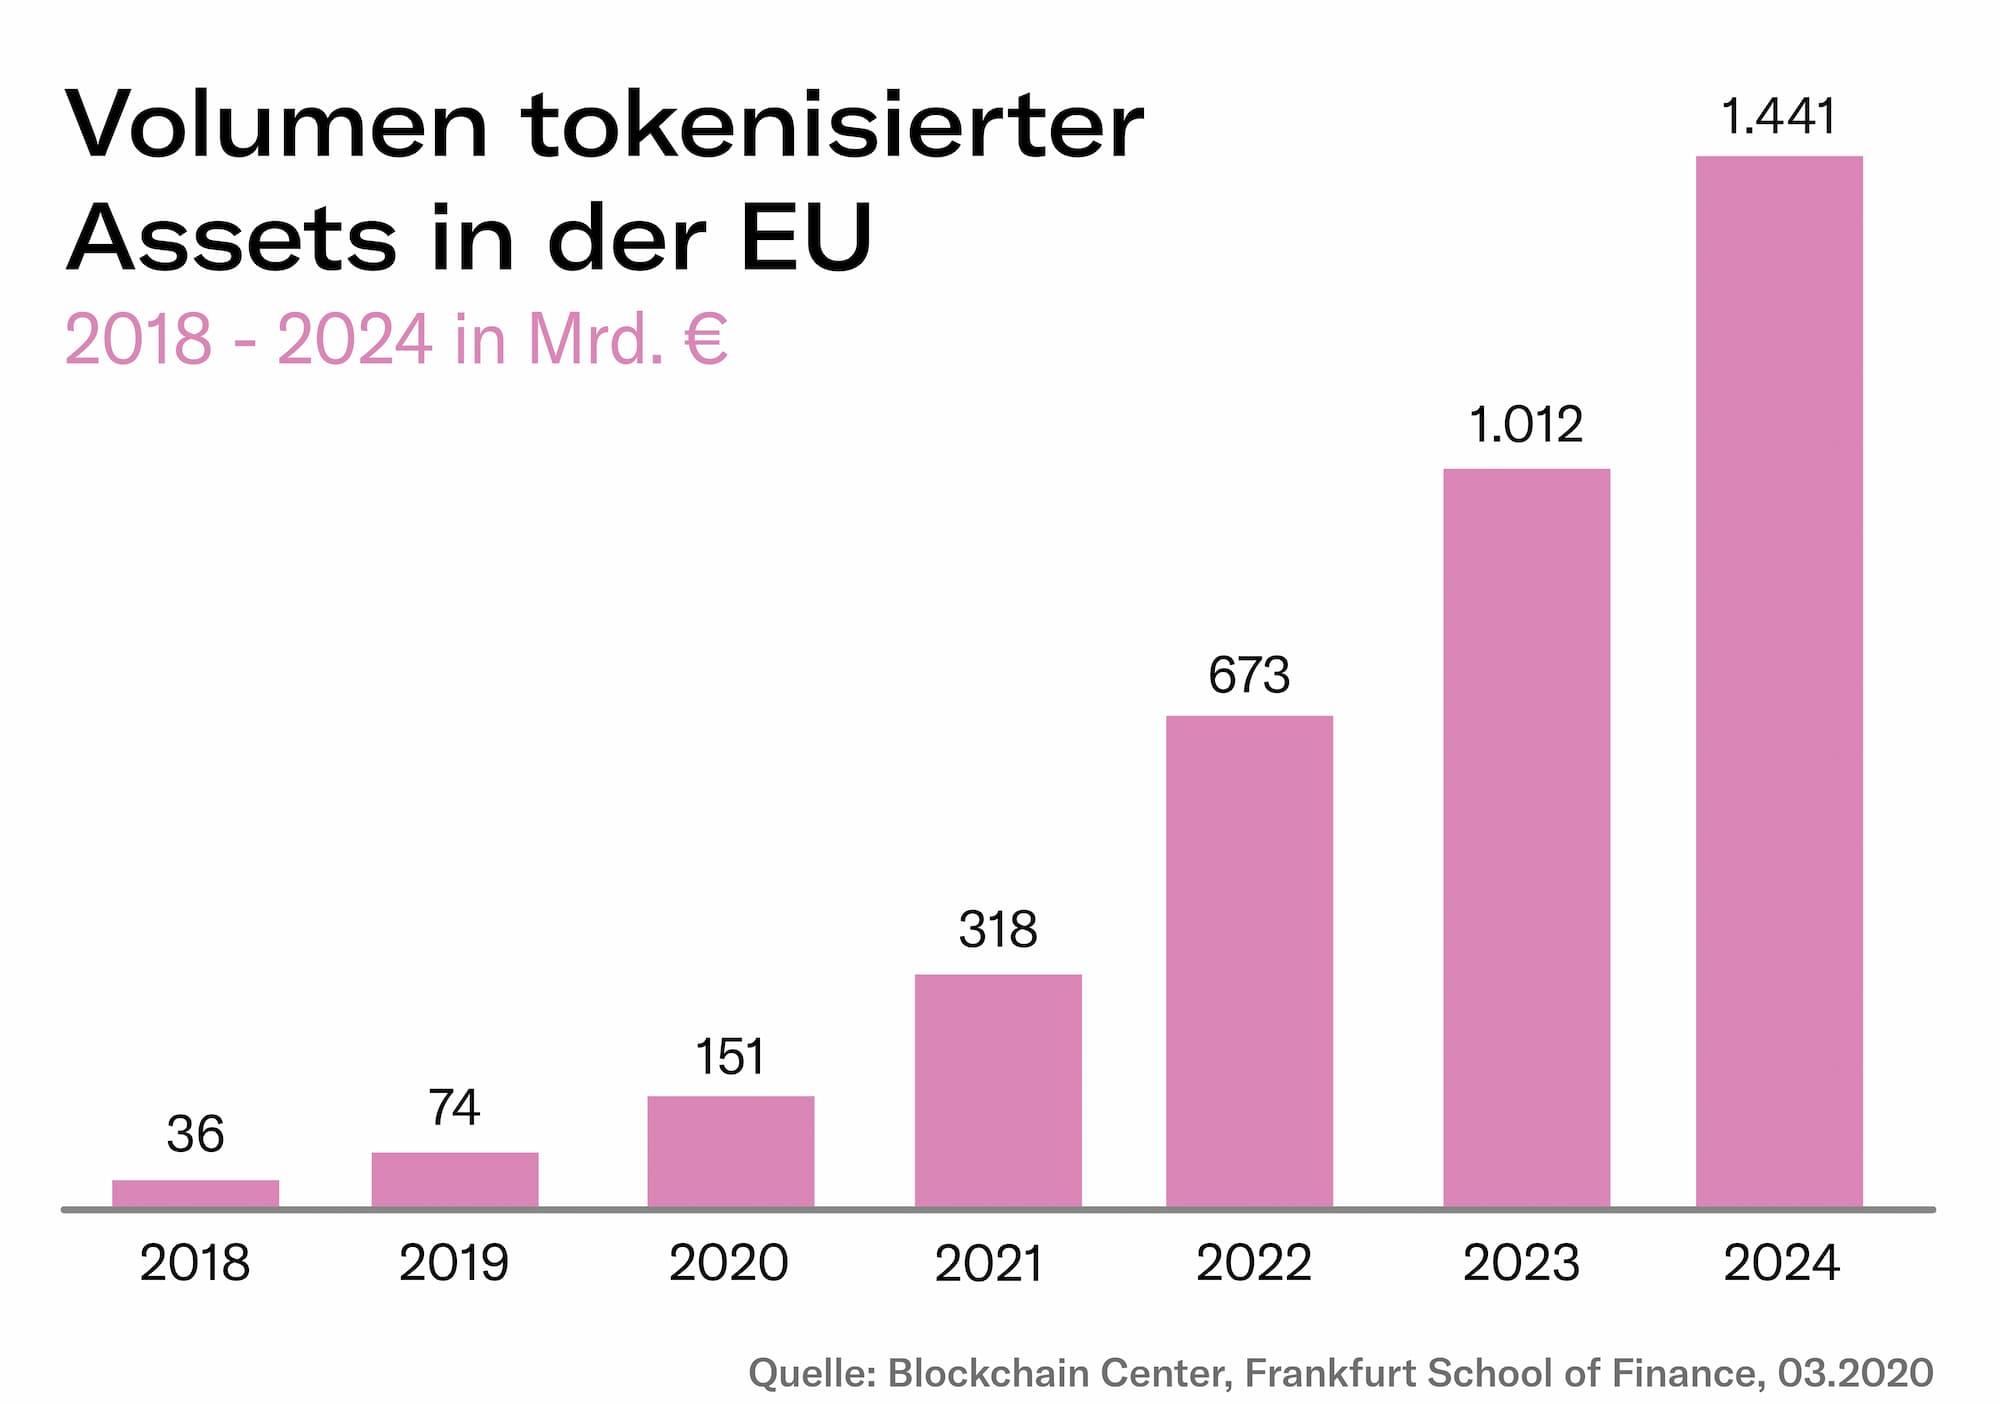 Volumen tokenisierte Assets EU